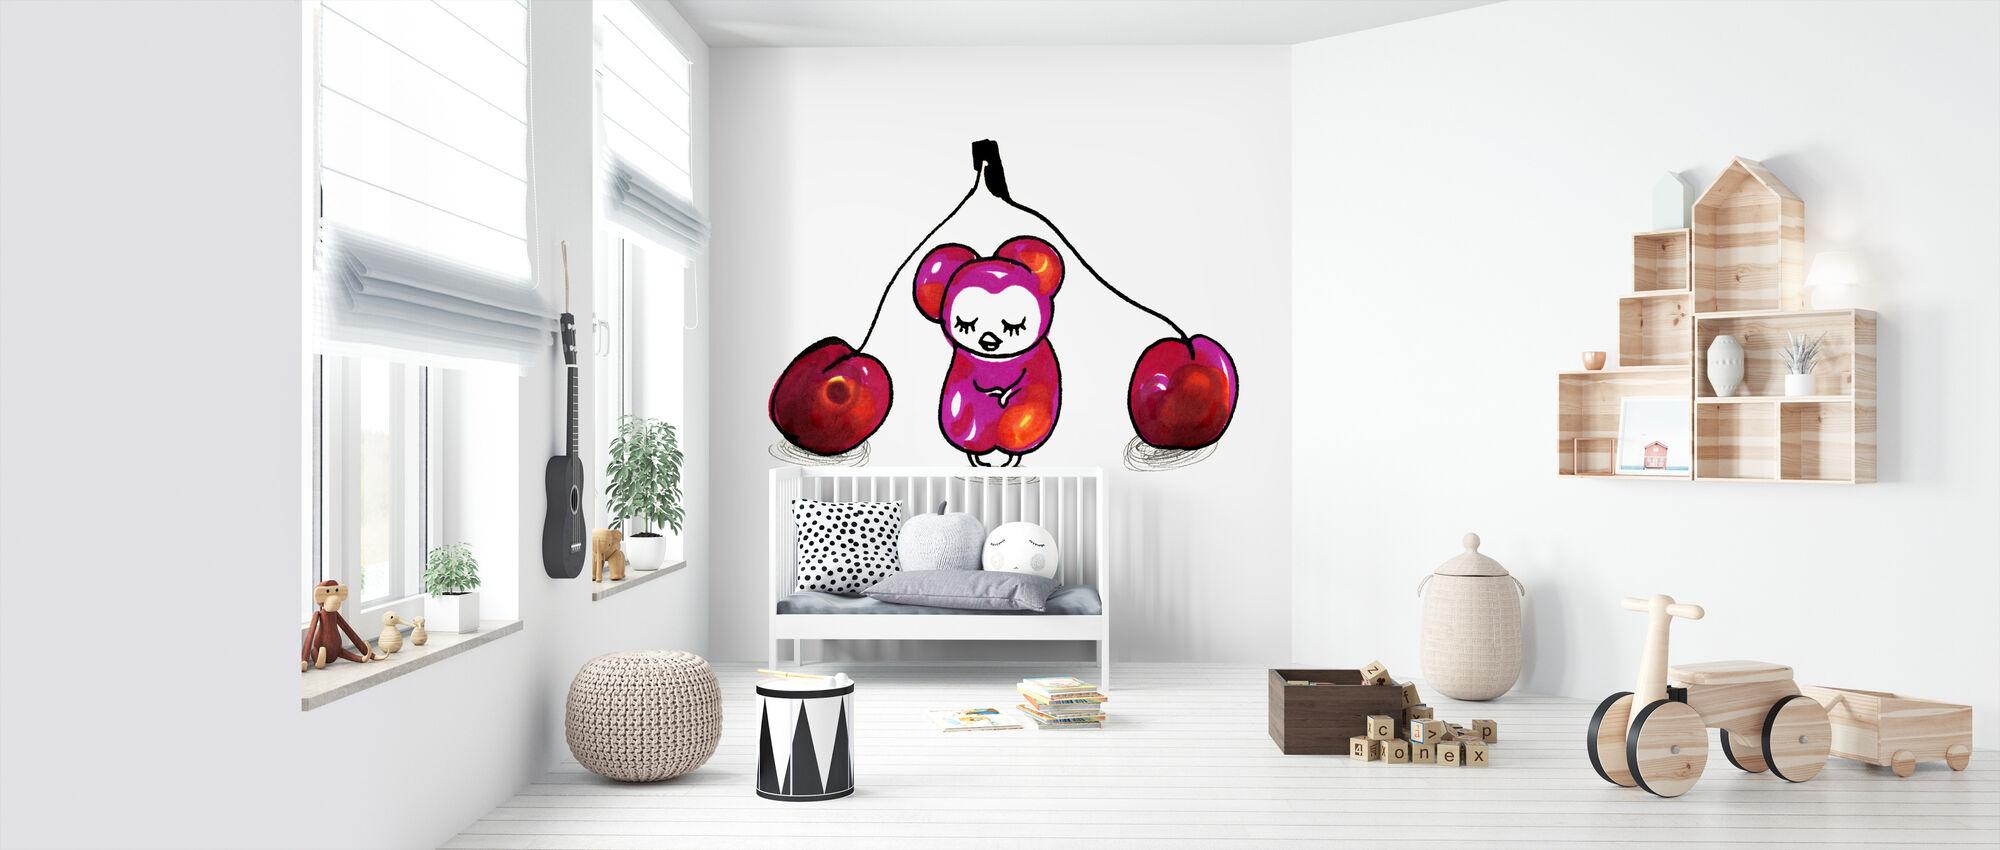 Kersen - Behang - Babykamer